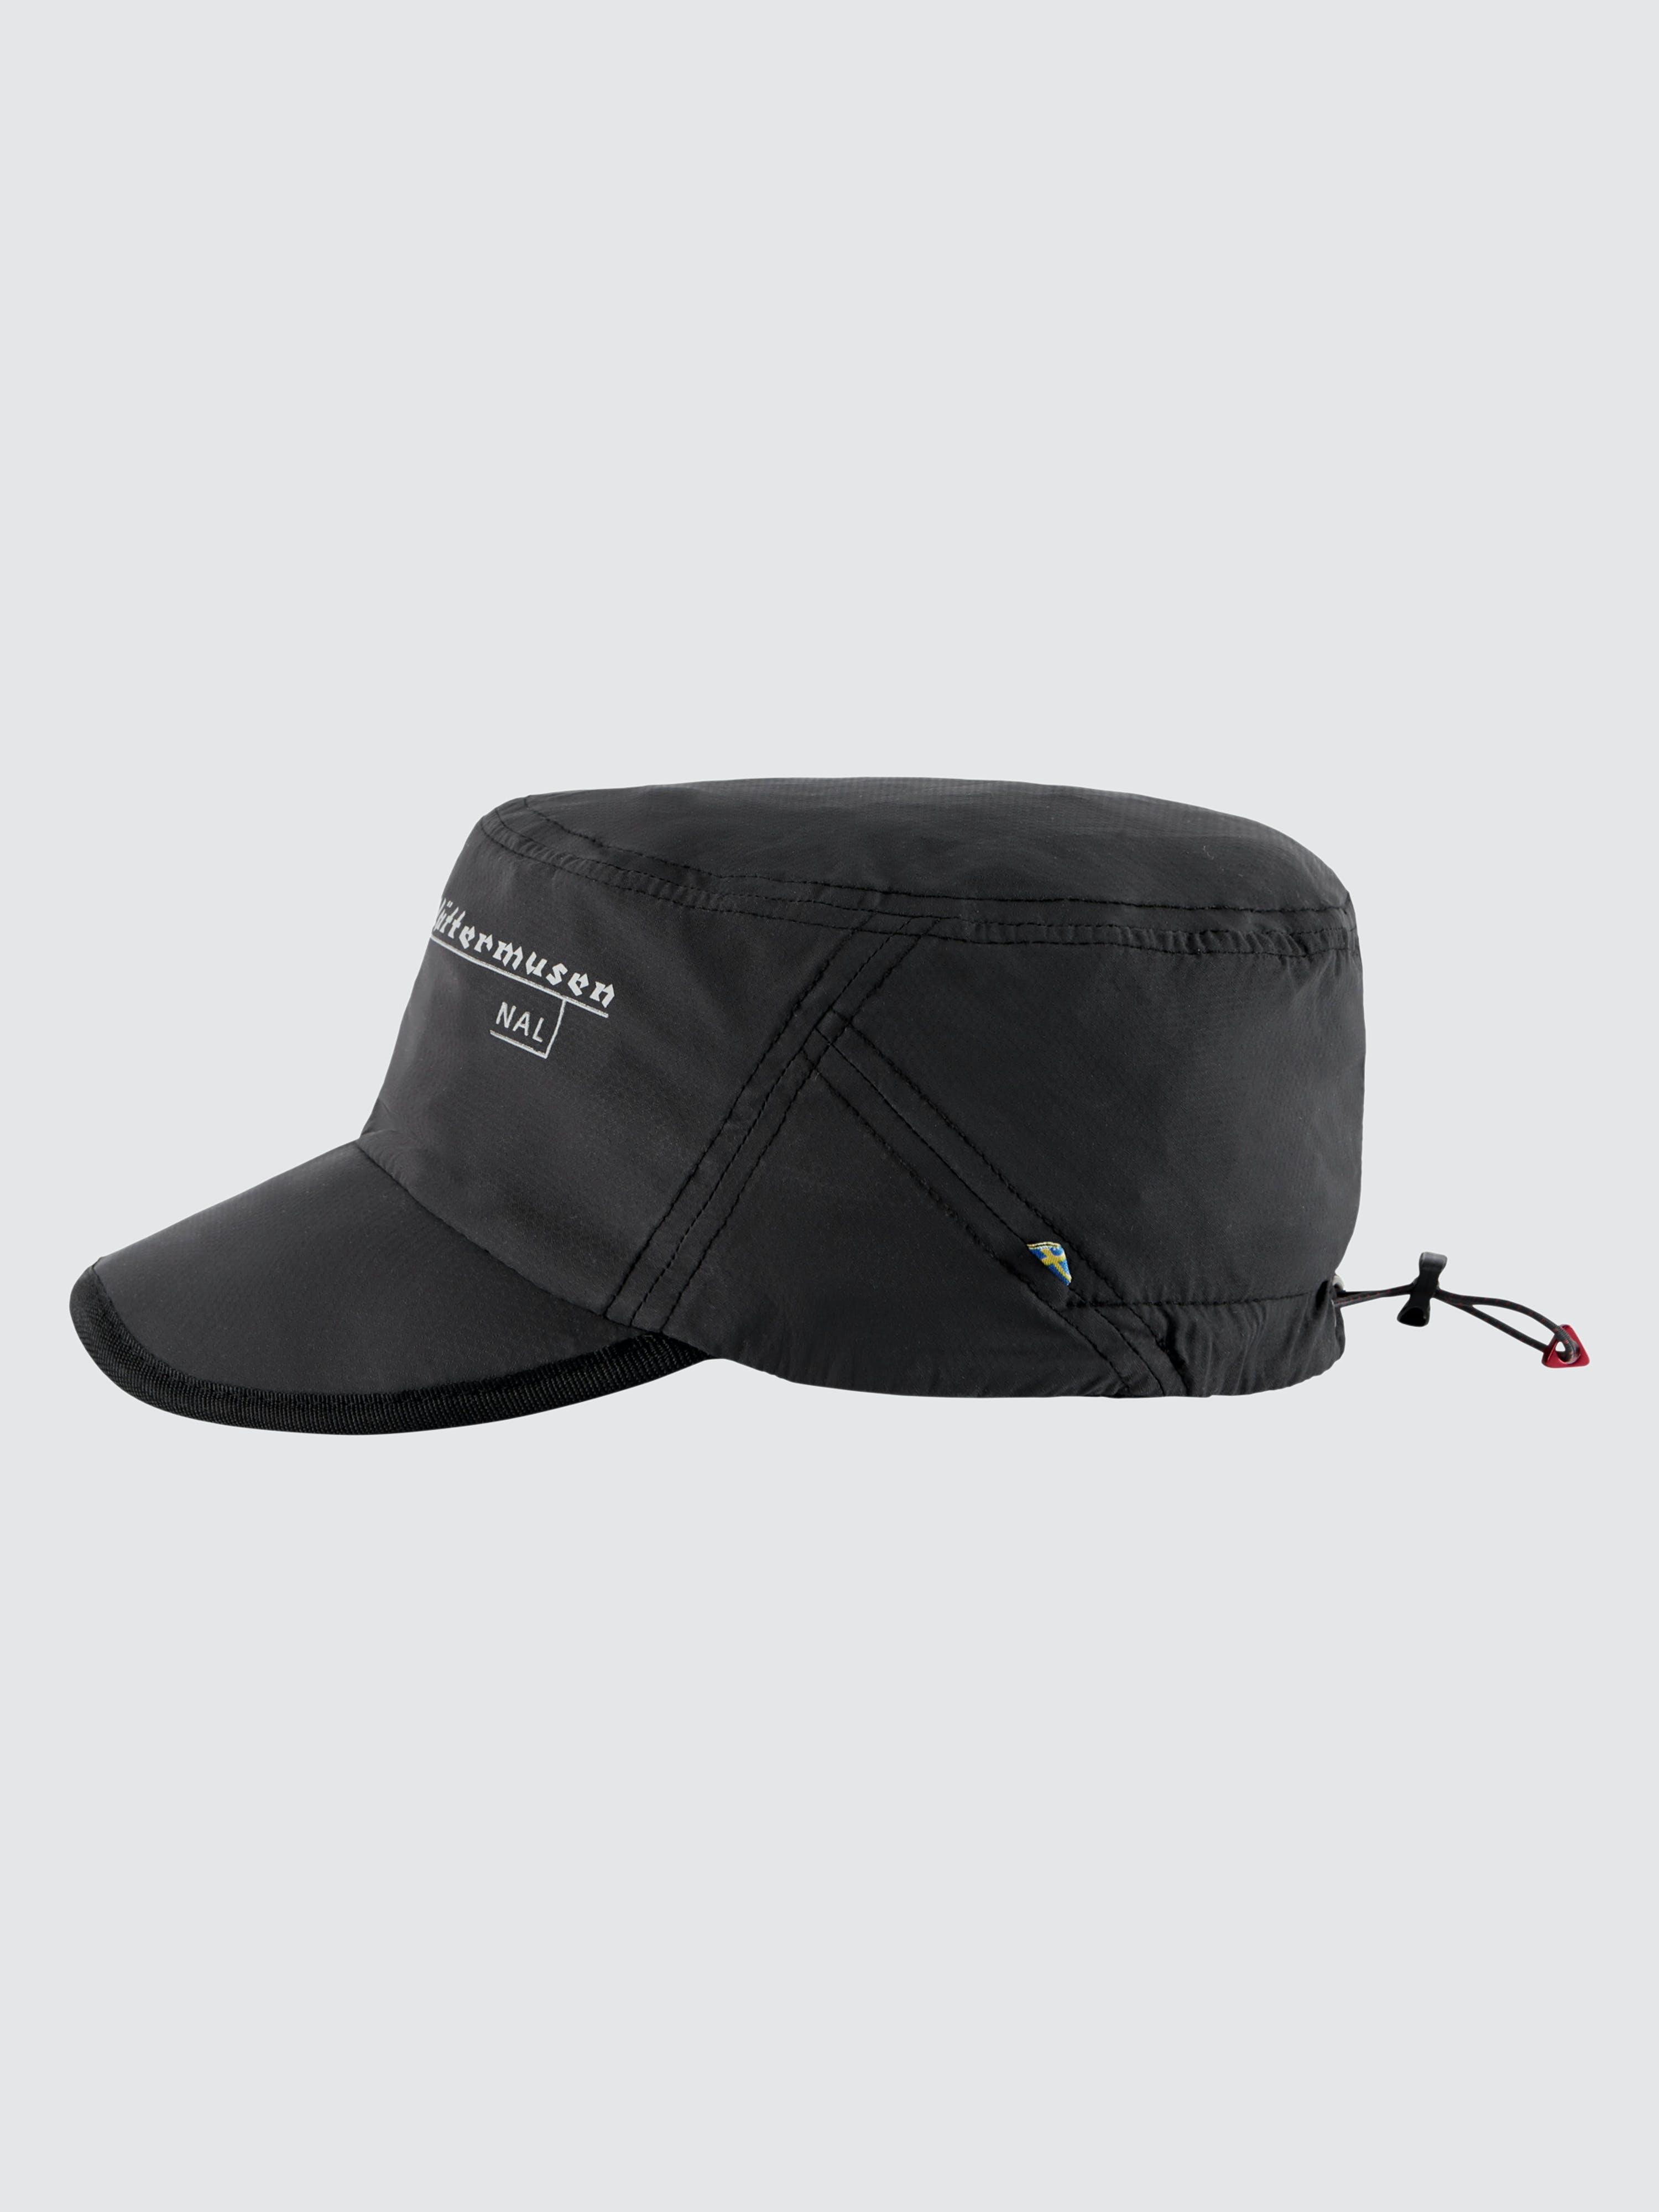 Klattermusen Nal Cap - ONE/SIZE  - Black